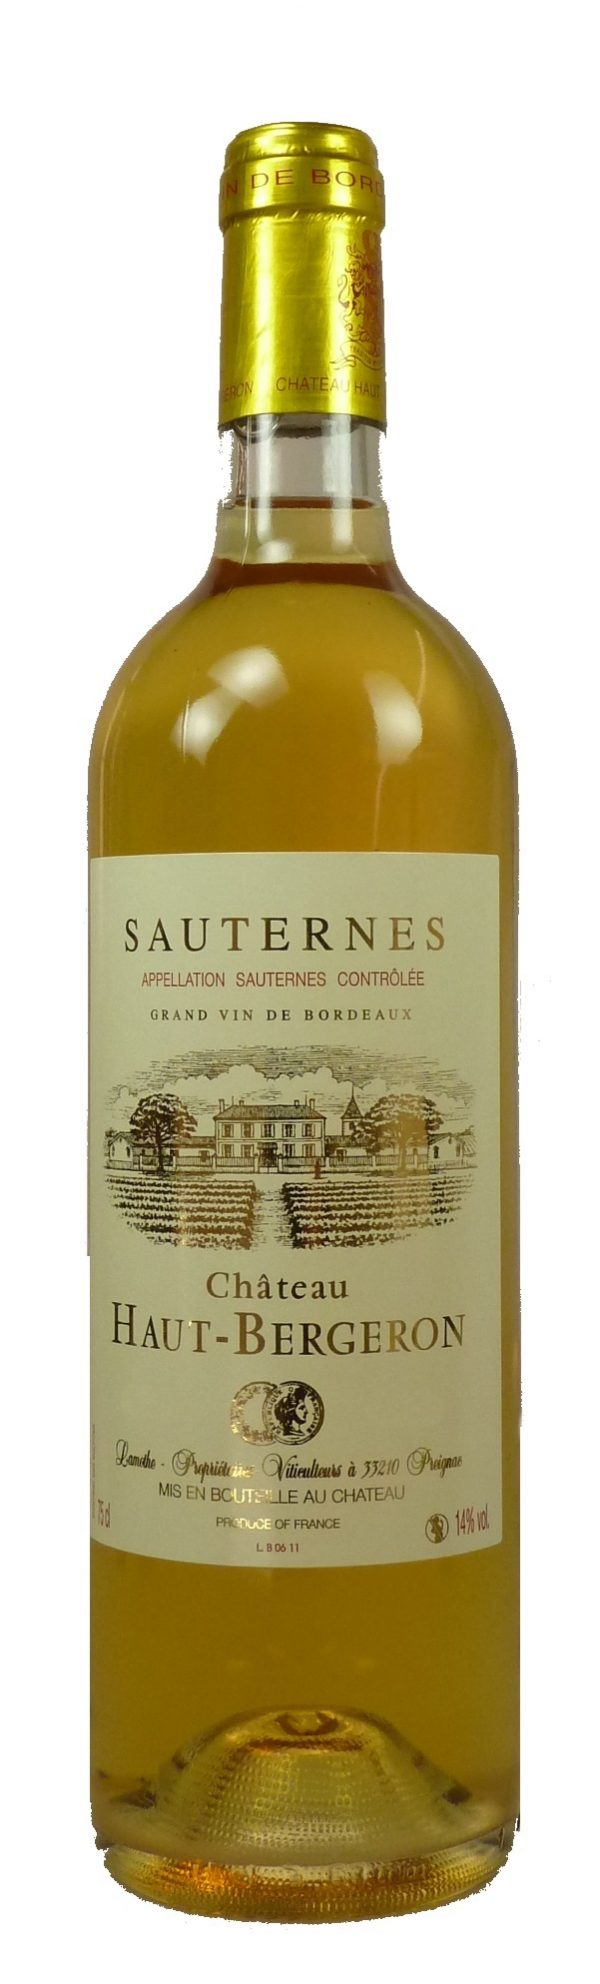 Sauternes 2015